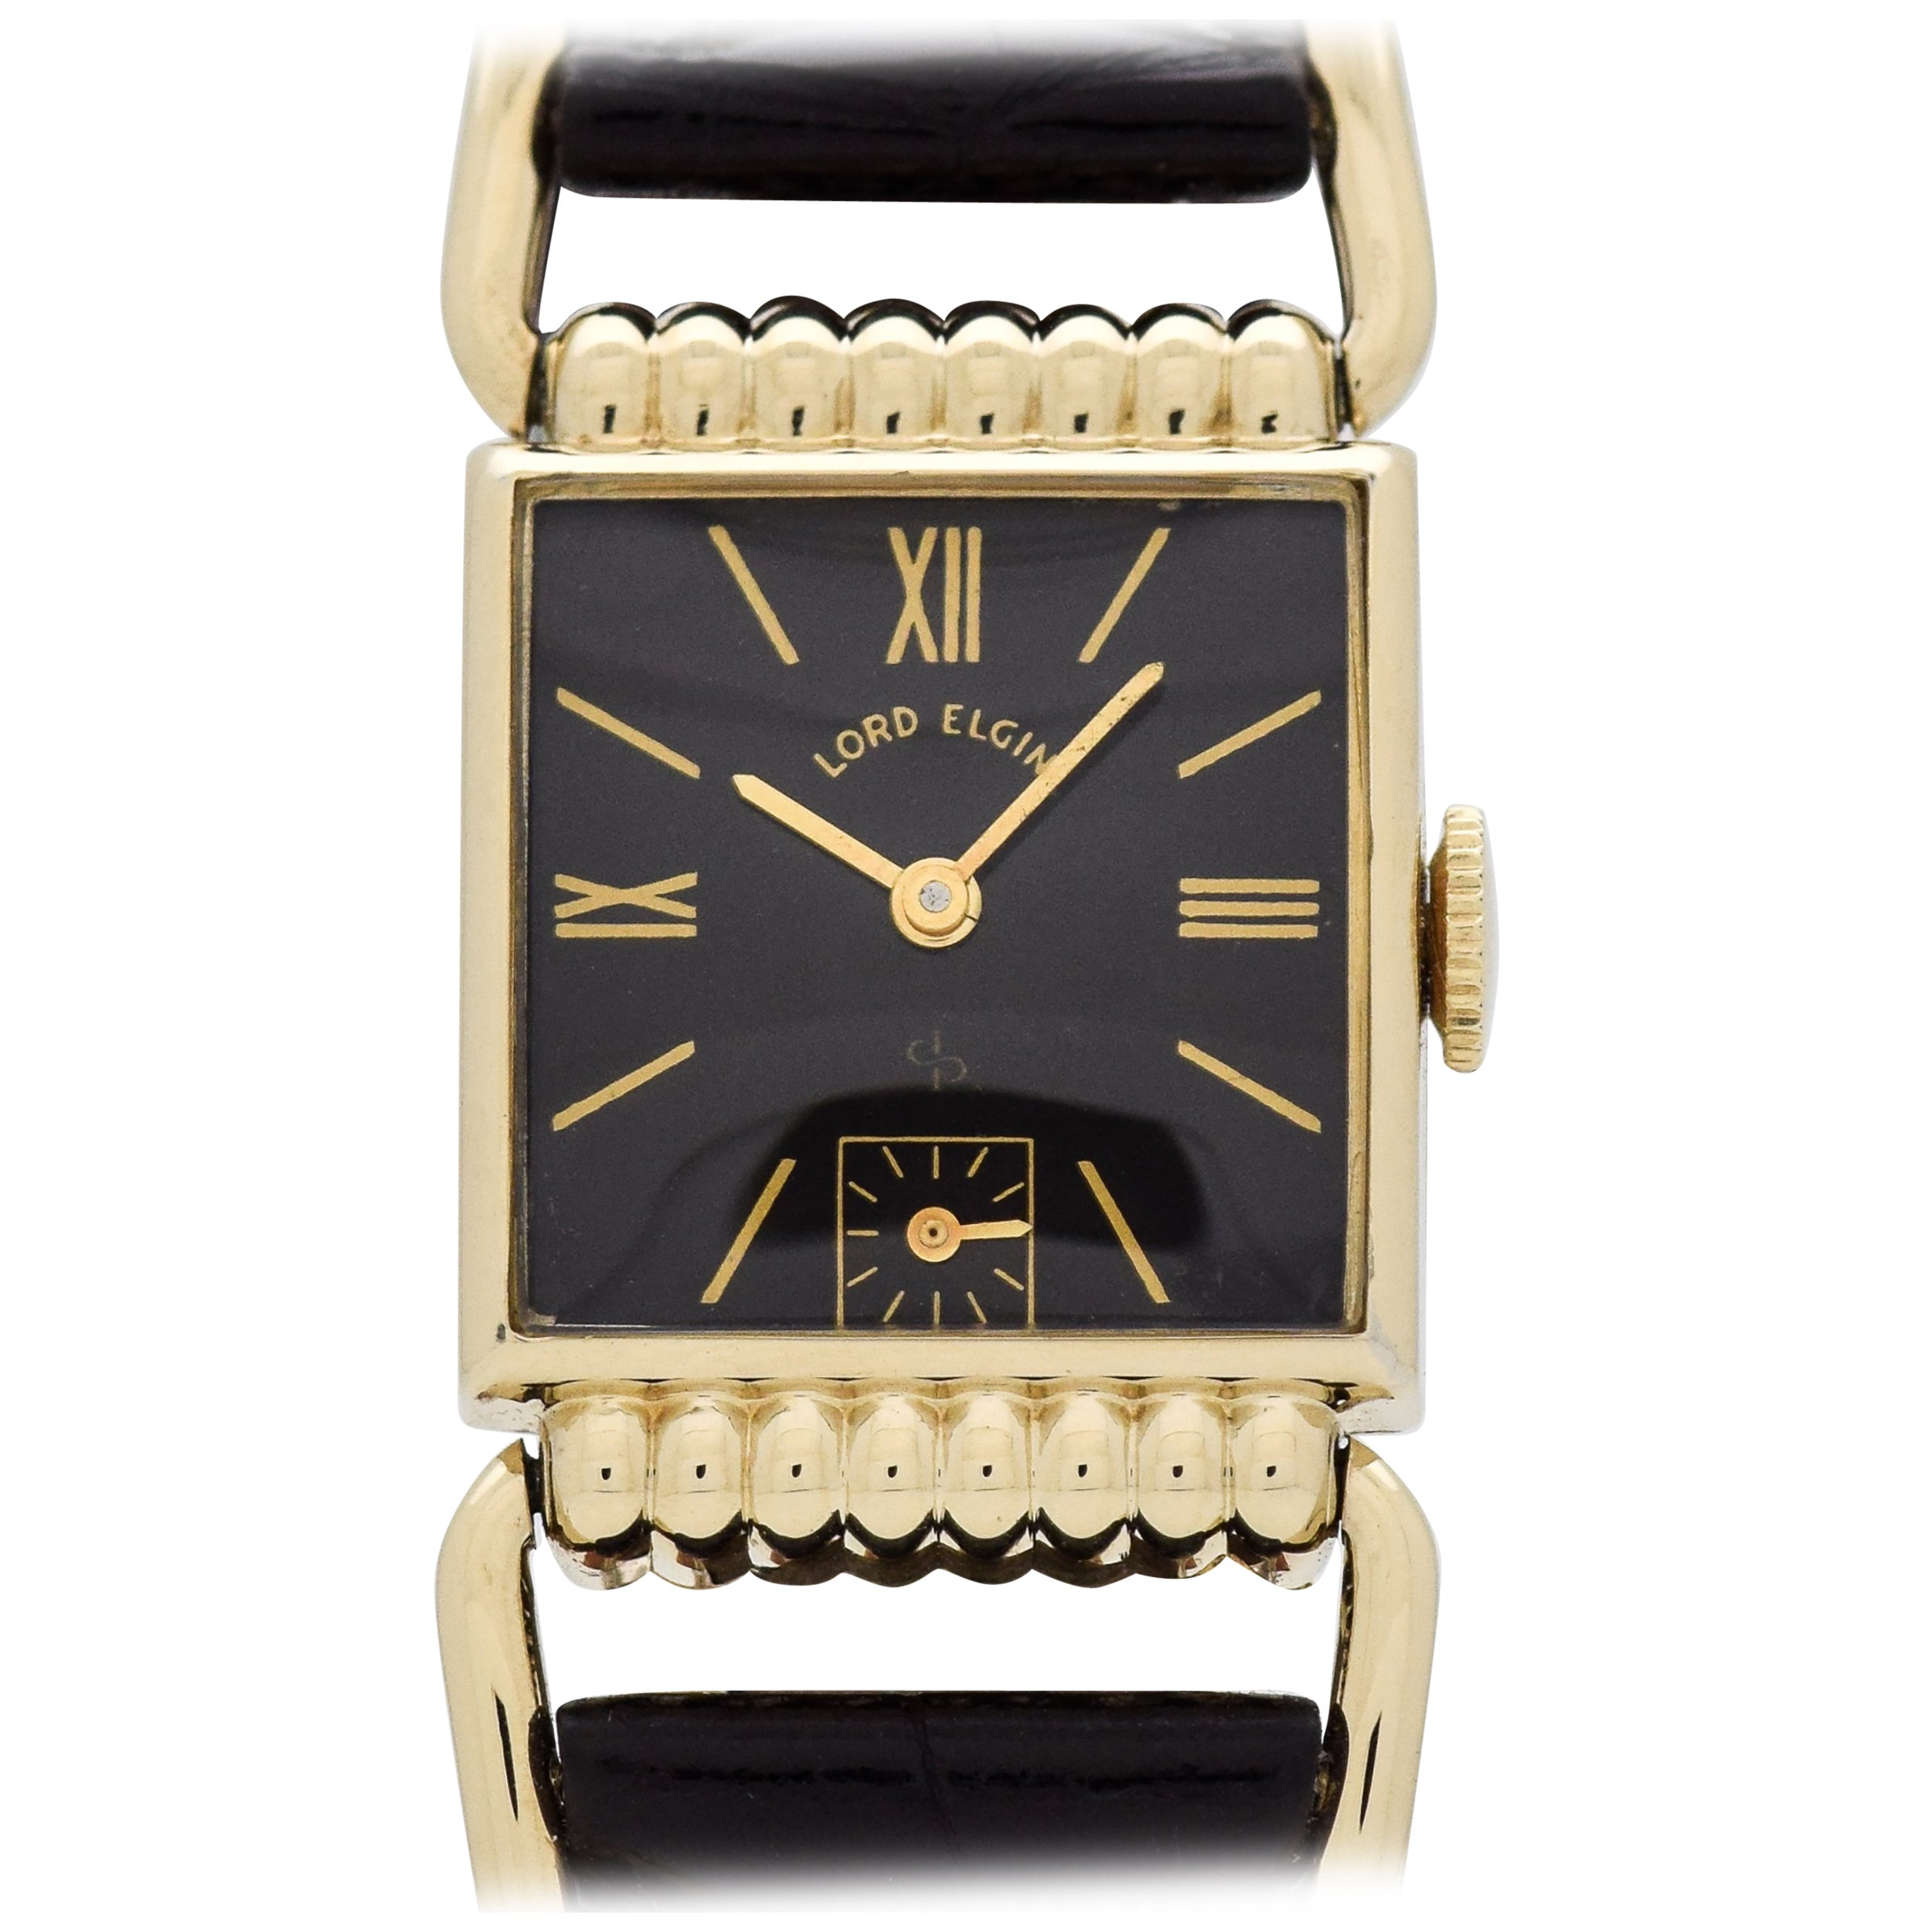 93de9b818baf Vintage Elgin Driver s Watch with a Black Dial